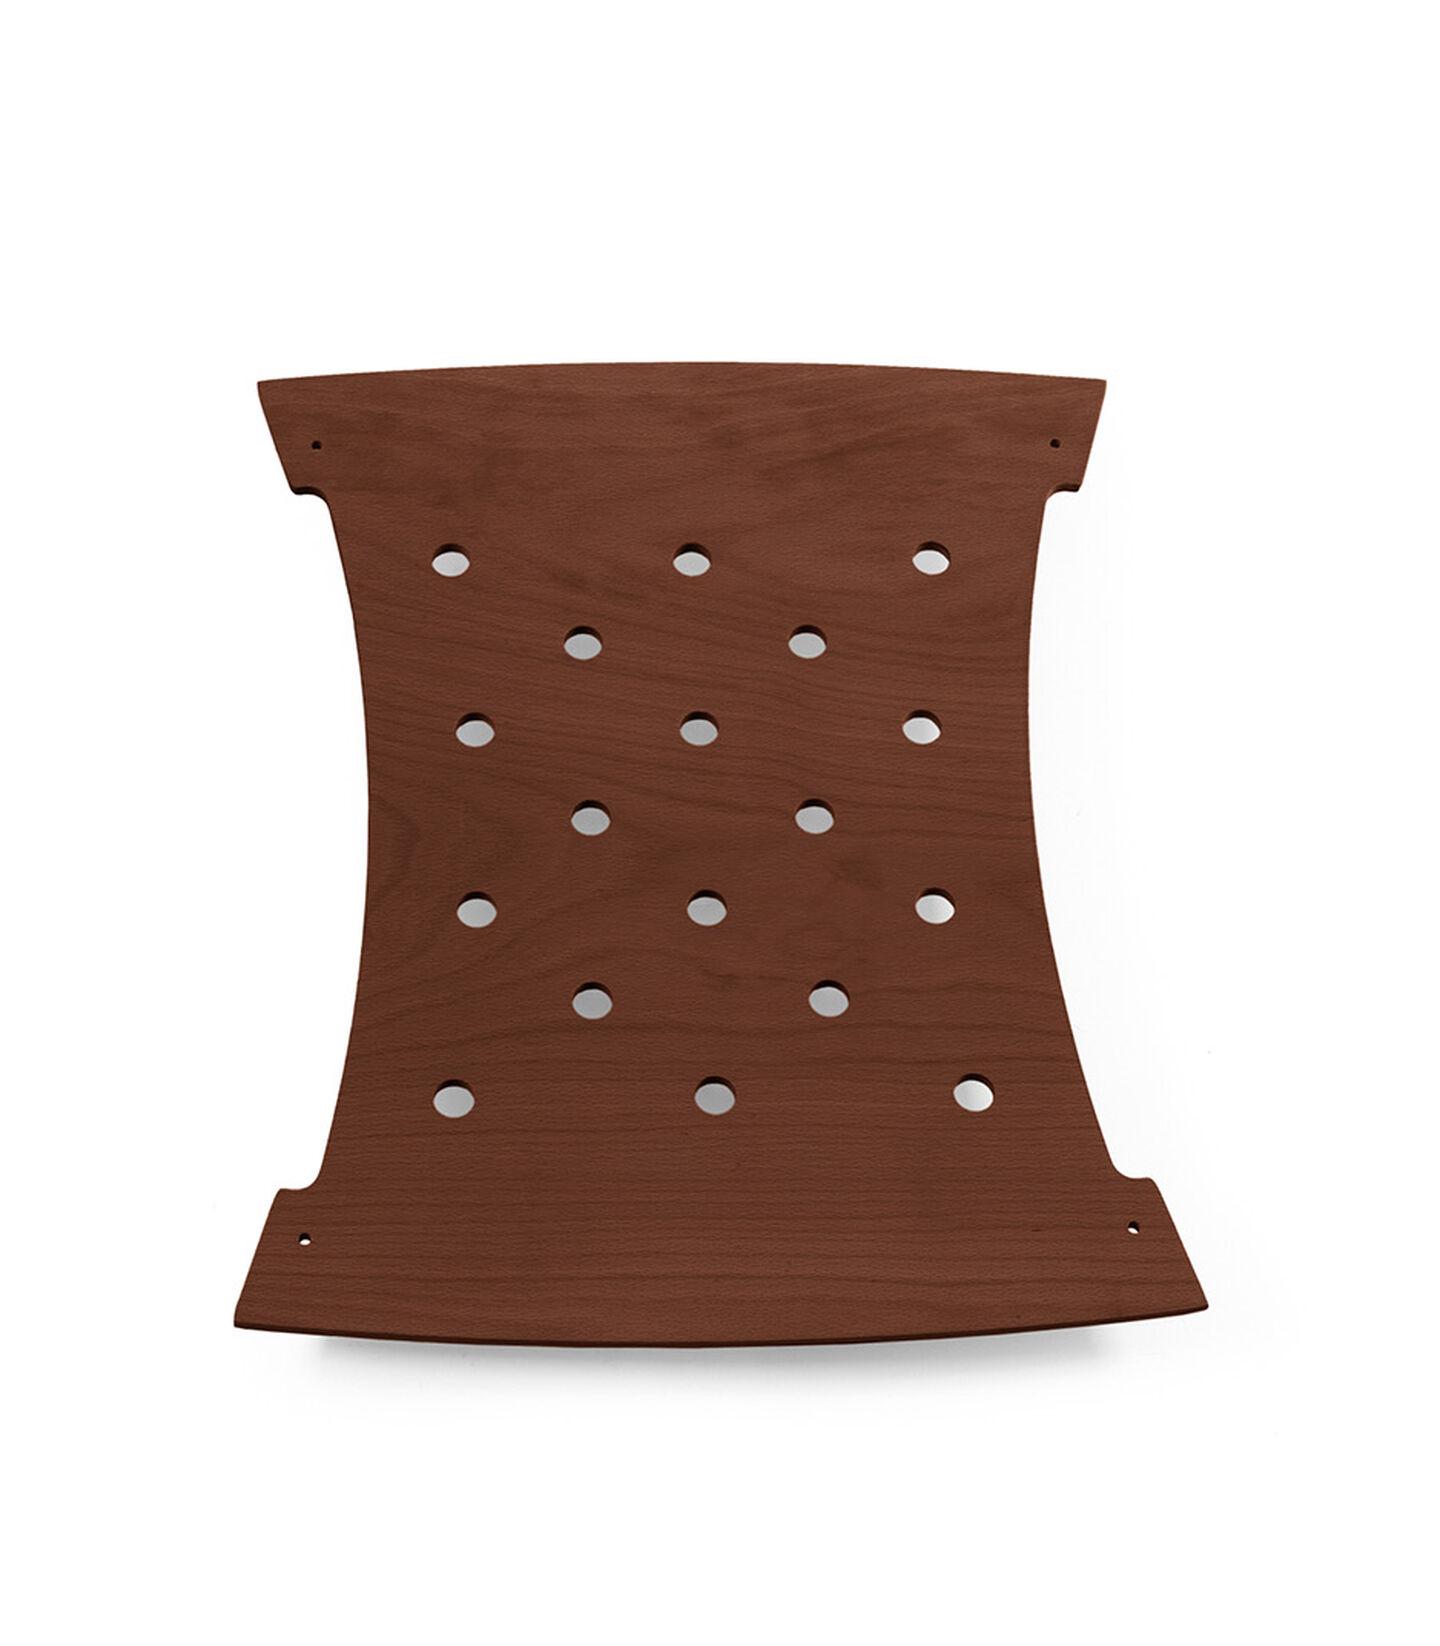 Stokke® Sleepi™ Bed bodem middenstuk Walnut Brown, Walnut, mainview view 2